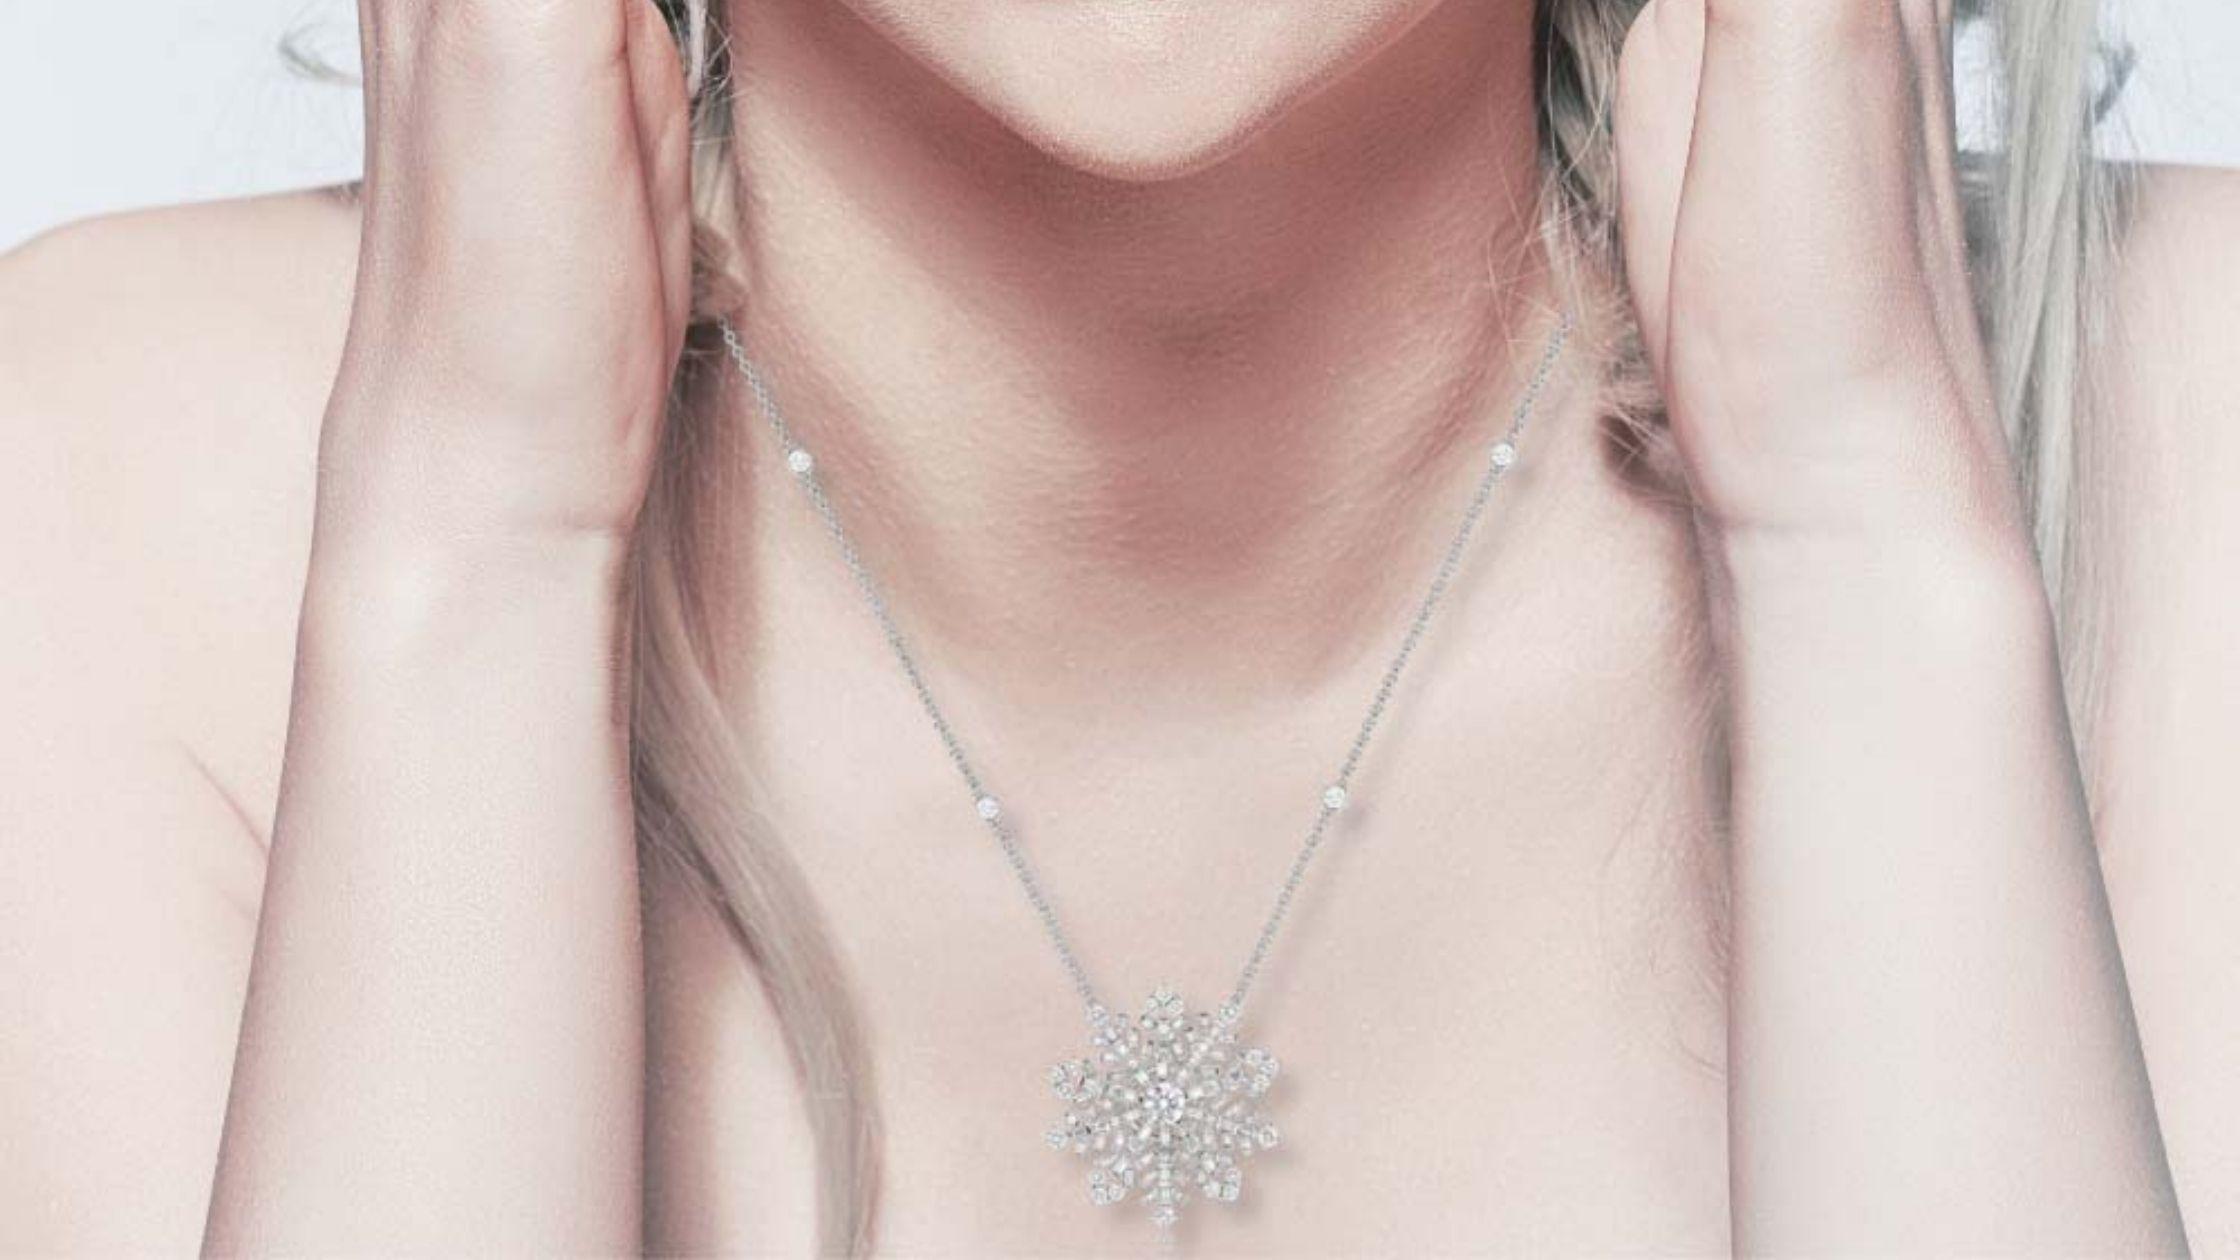 Snowflake Jewelry For The Season: A Lavari Exclusive